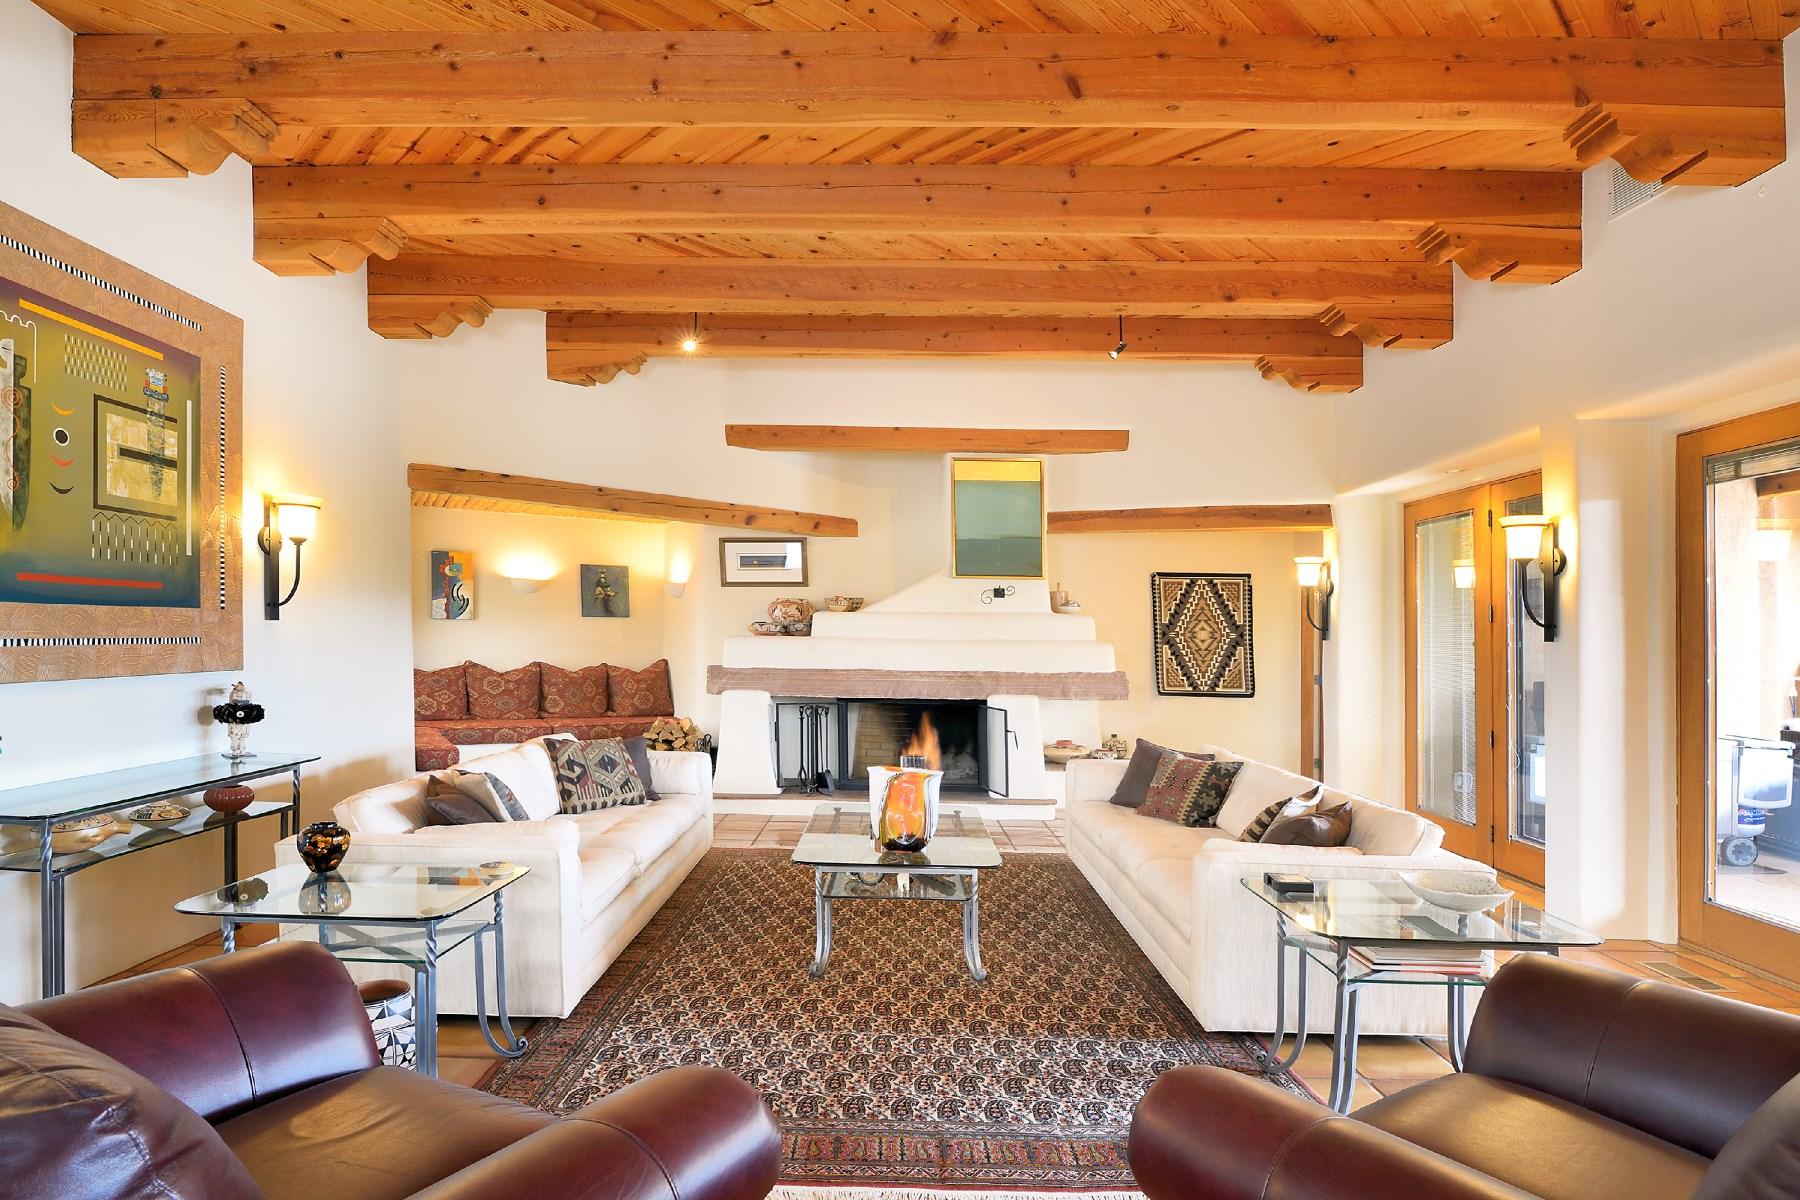 Single Family Home for Sale at 1353 Tano Ridge Santa Fe City Northwest, Santa Fe, New Mexico 87506 United States